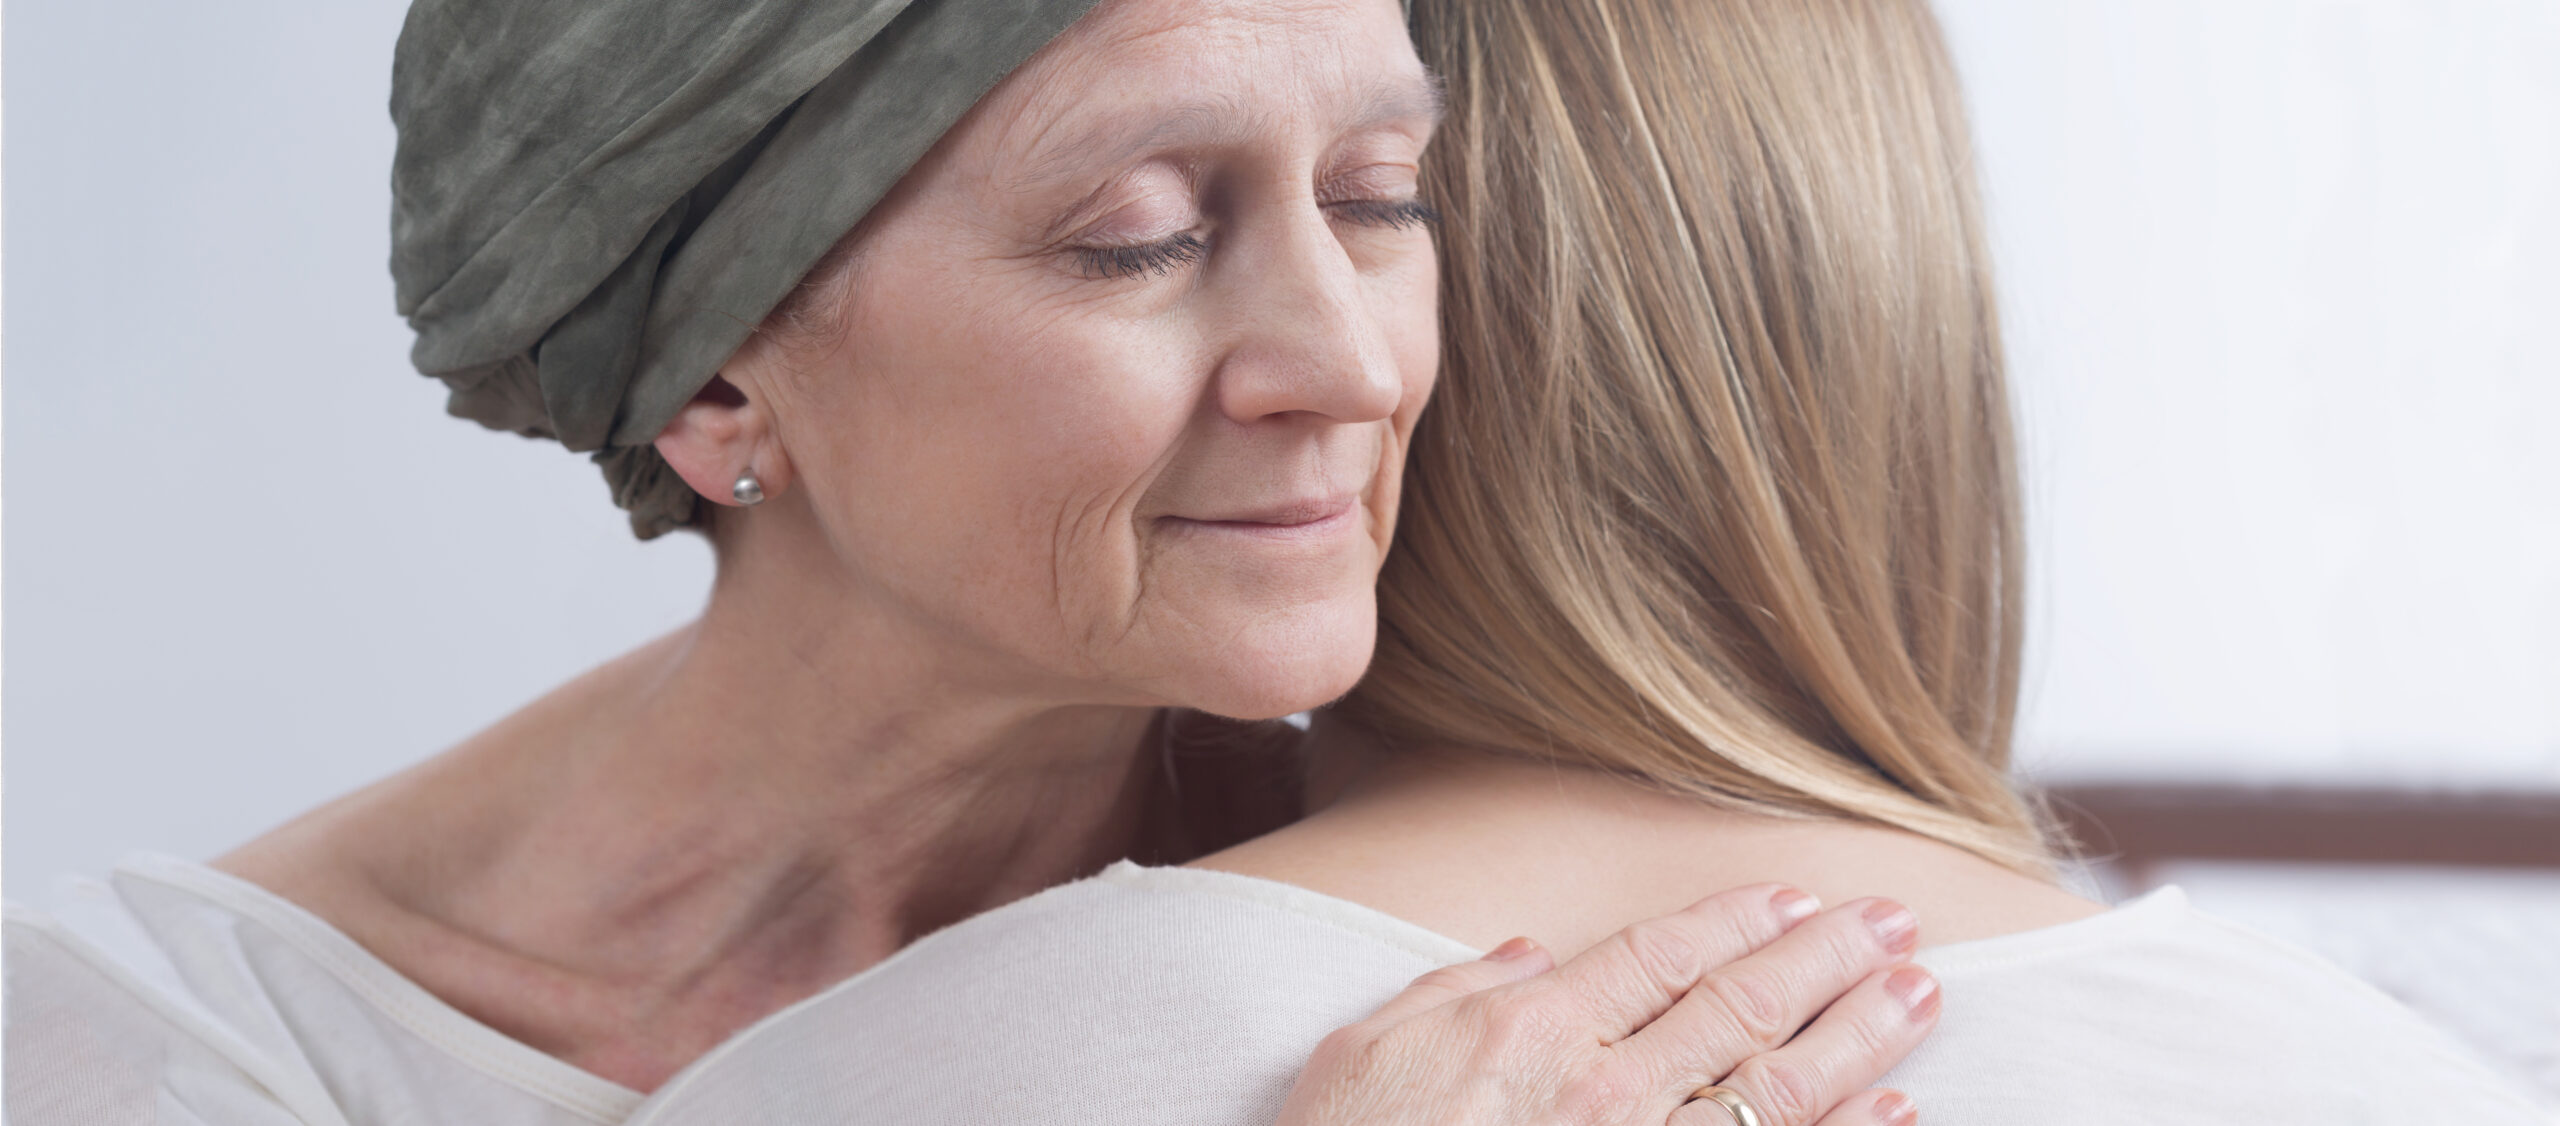 Contact Northwest Hope & Healing